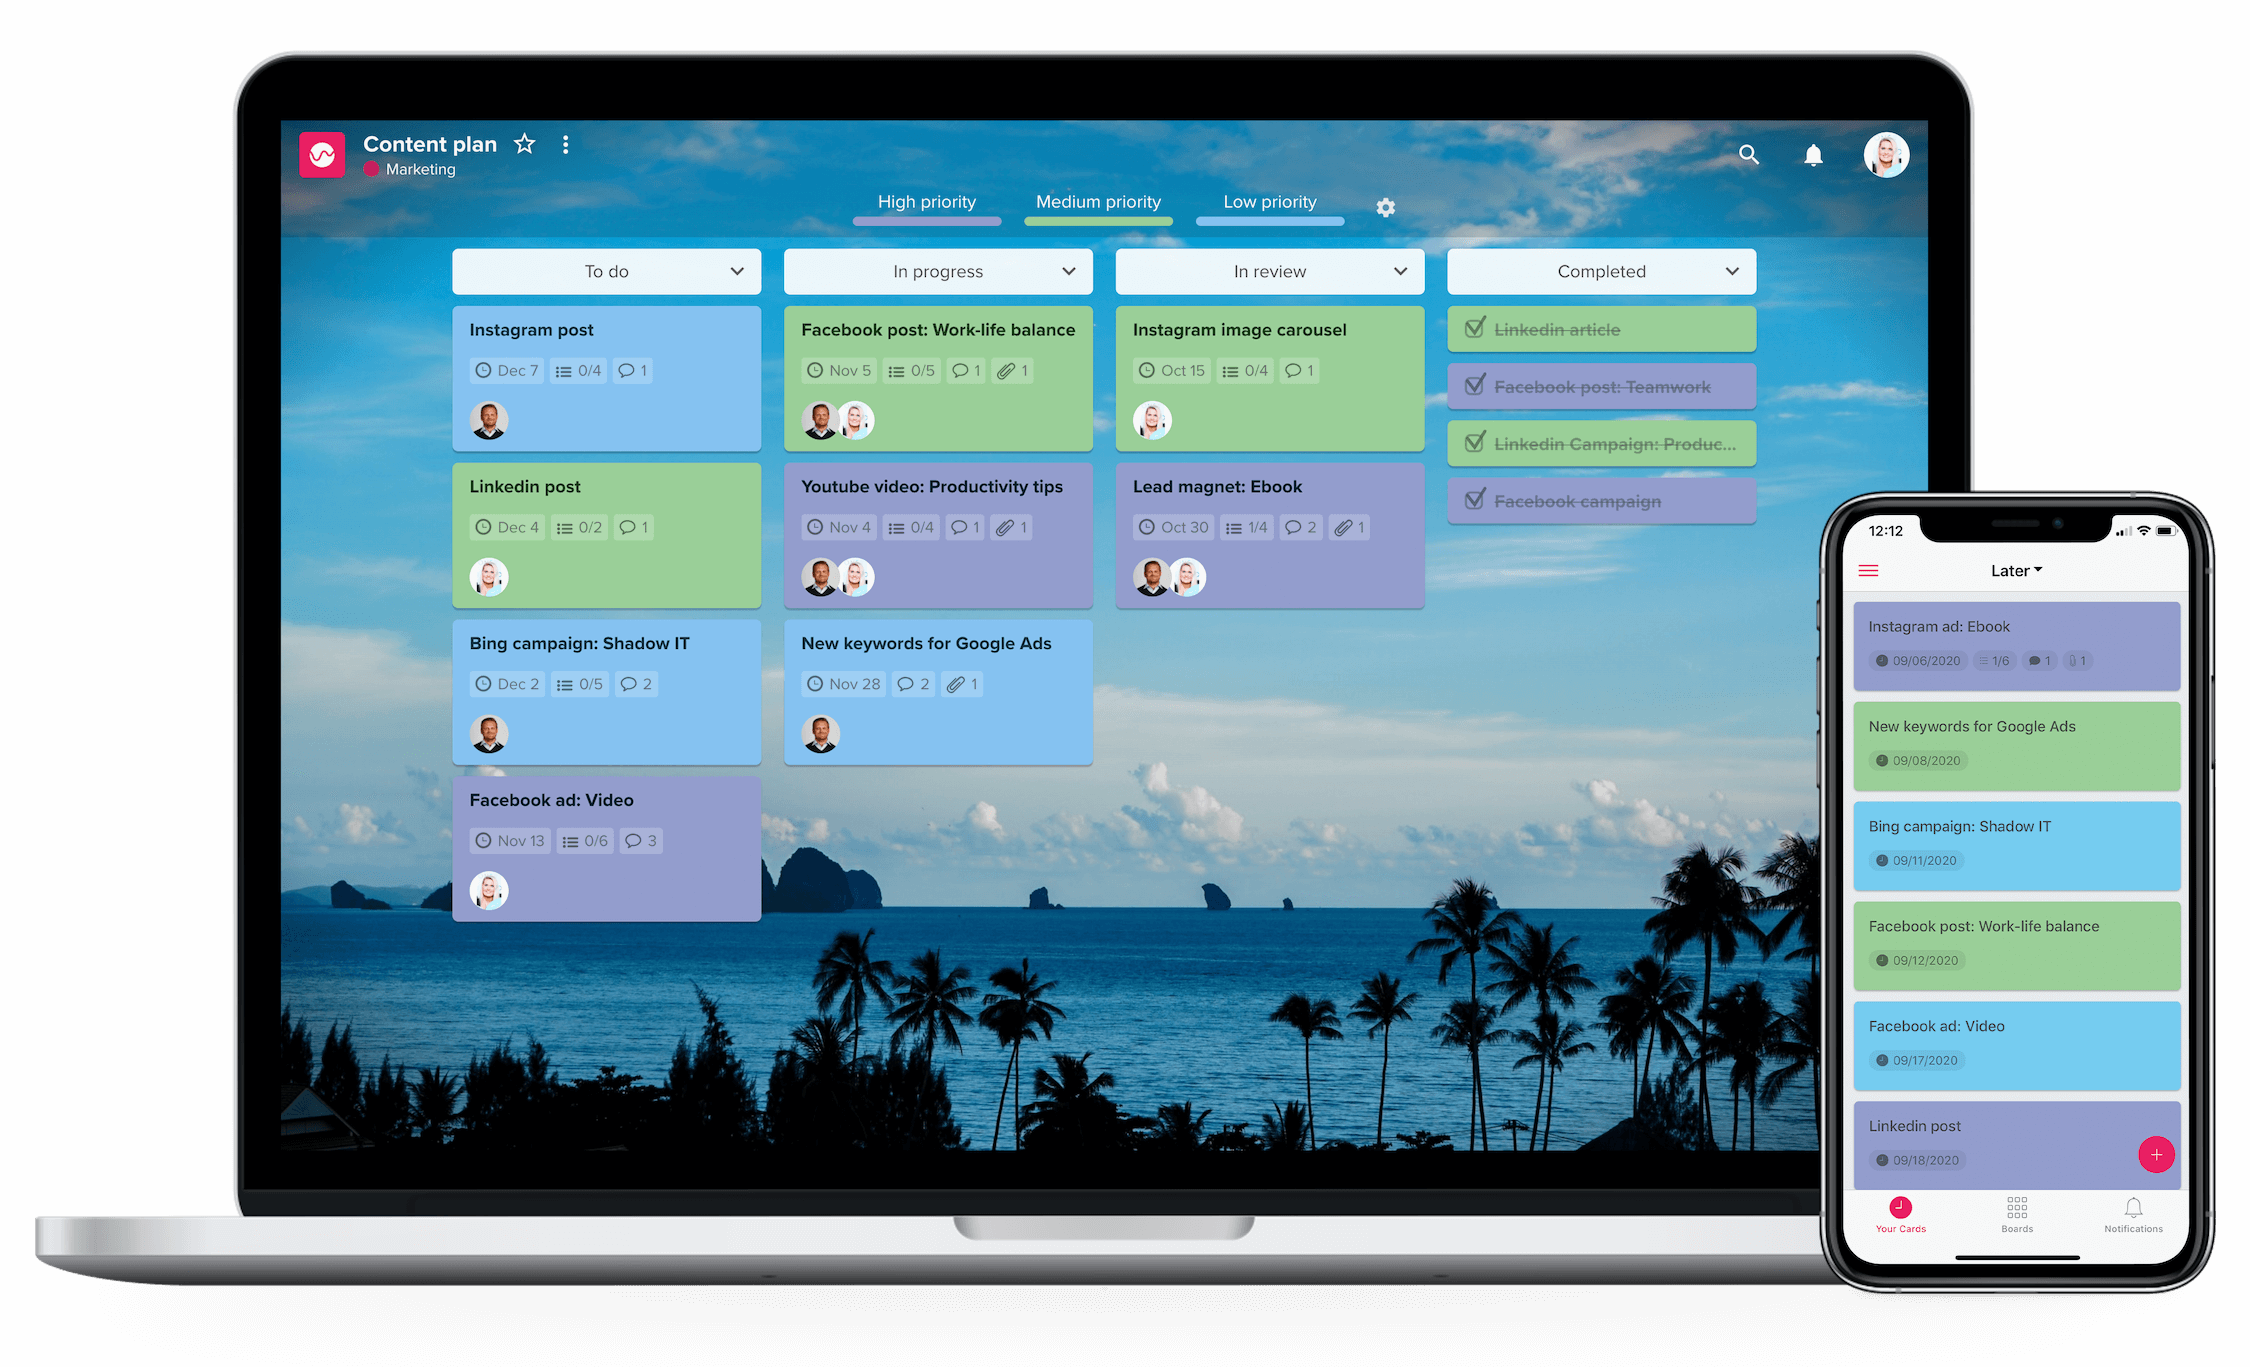 Macbook + iphone - content plan tavle